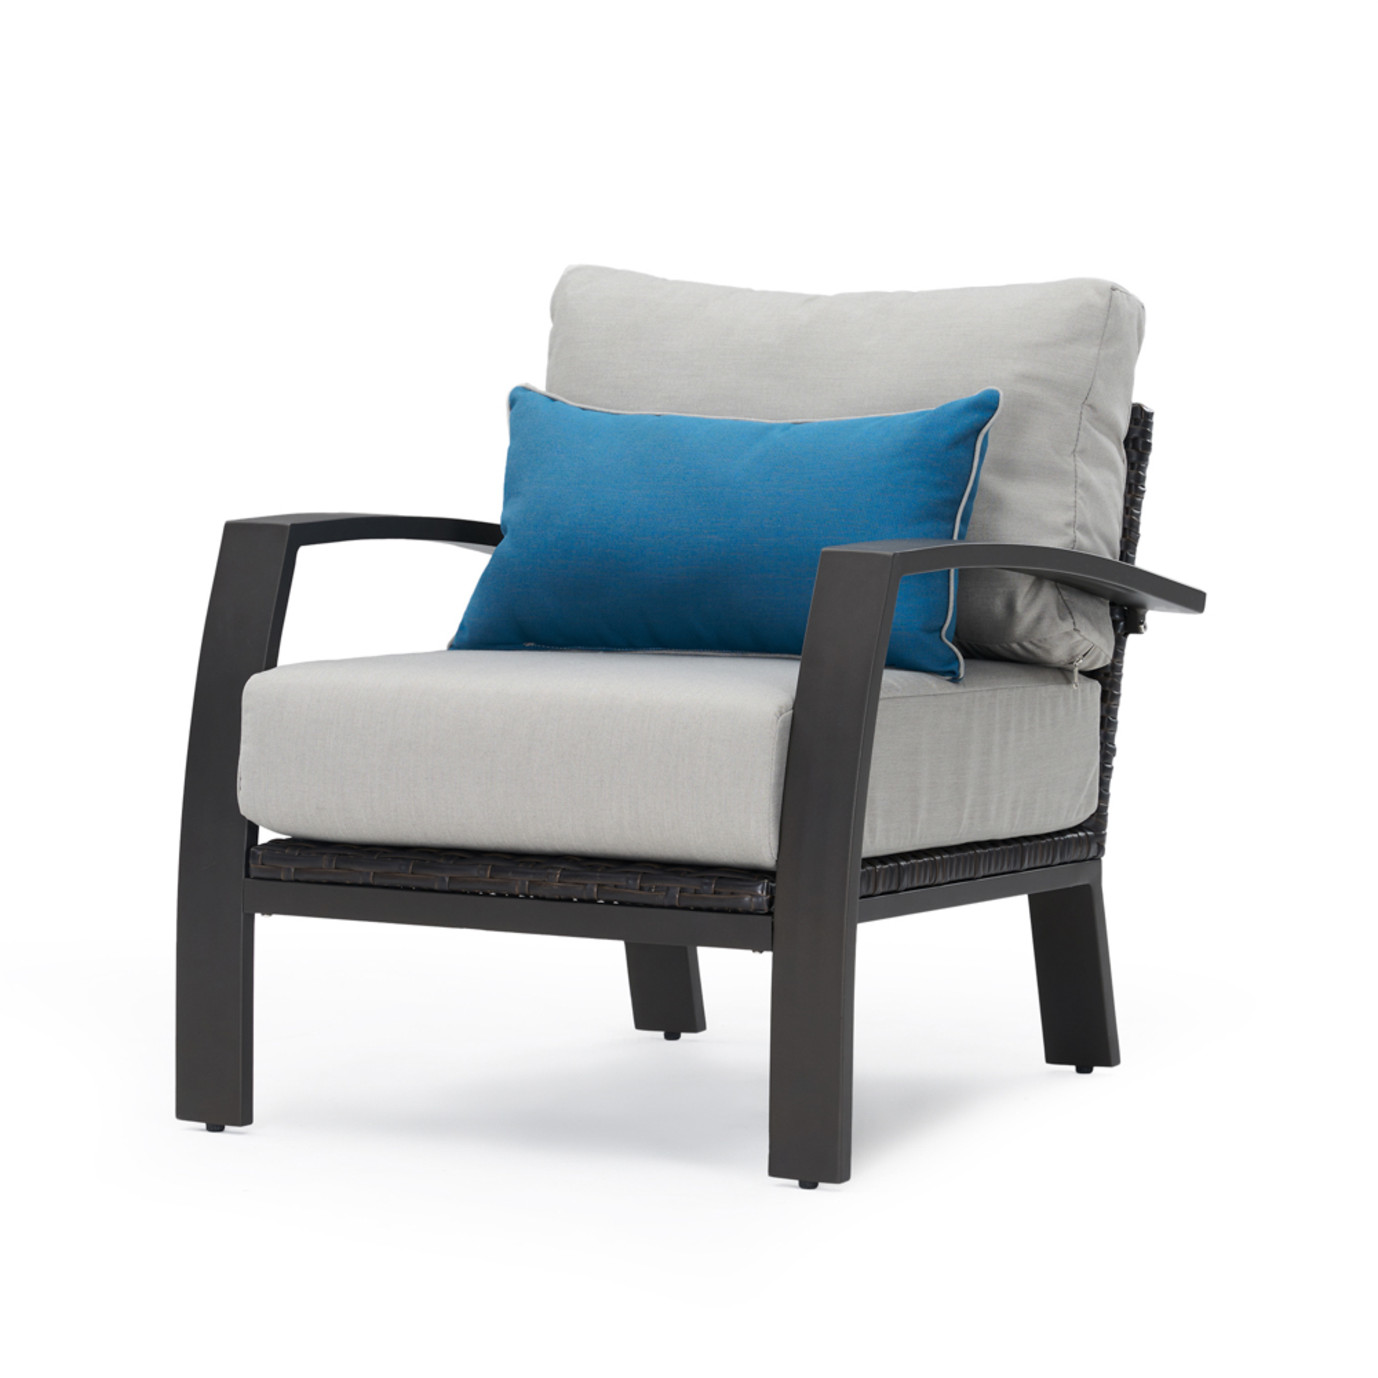 Portofino Repose 6 Piece Seating Set - Dove Gray